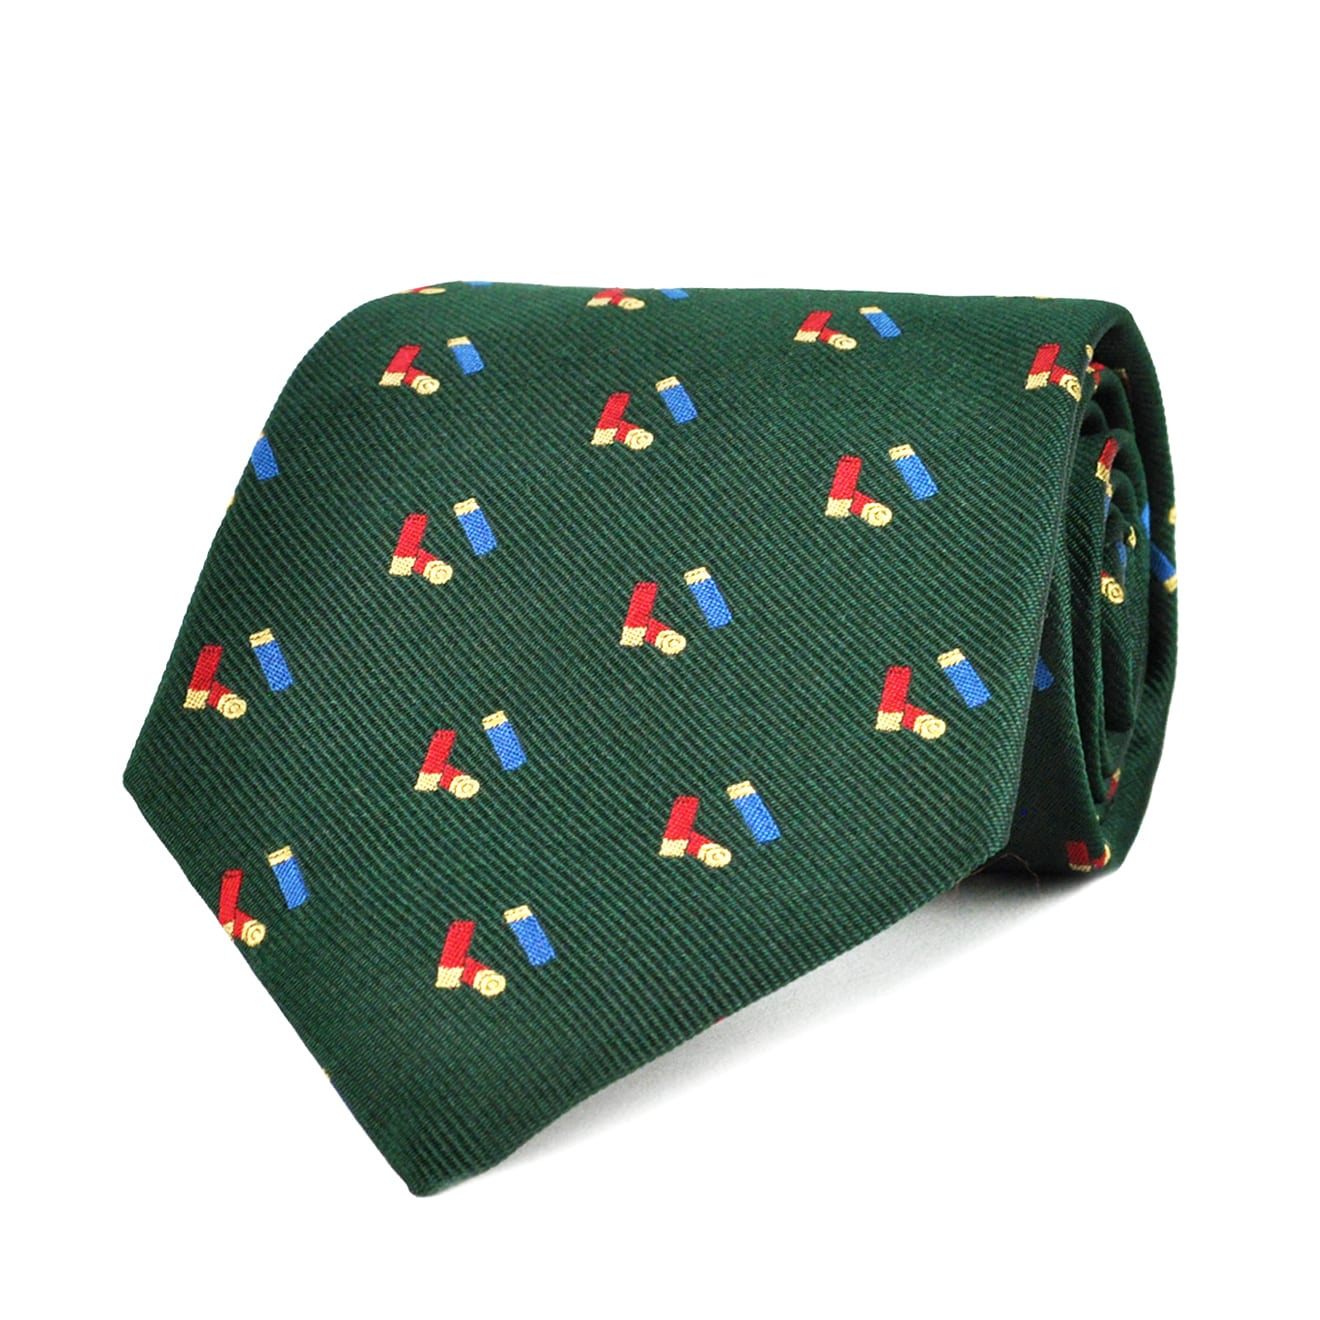 Sporting Lodge Woven Silk Mini Shotgun Cartridges Tie Dark Green